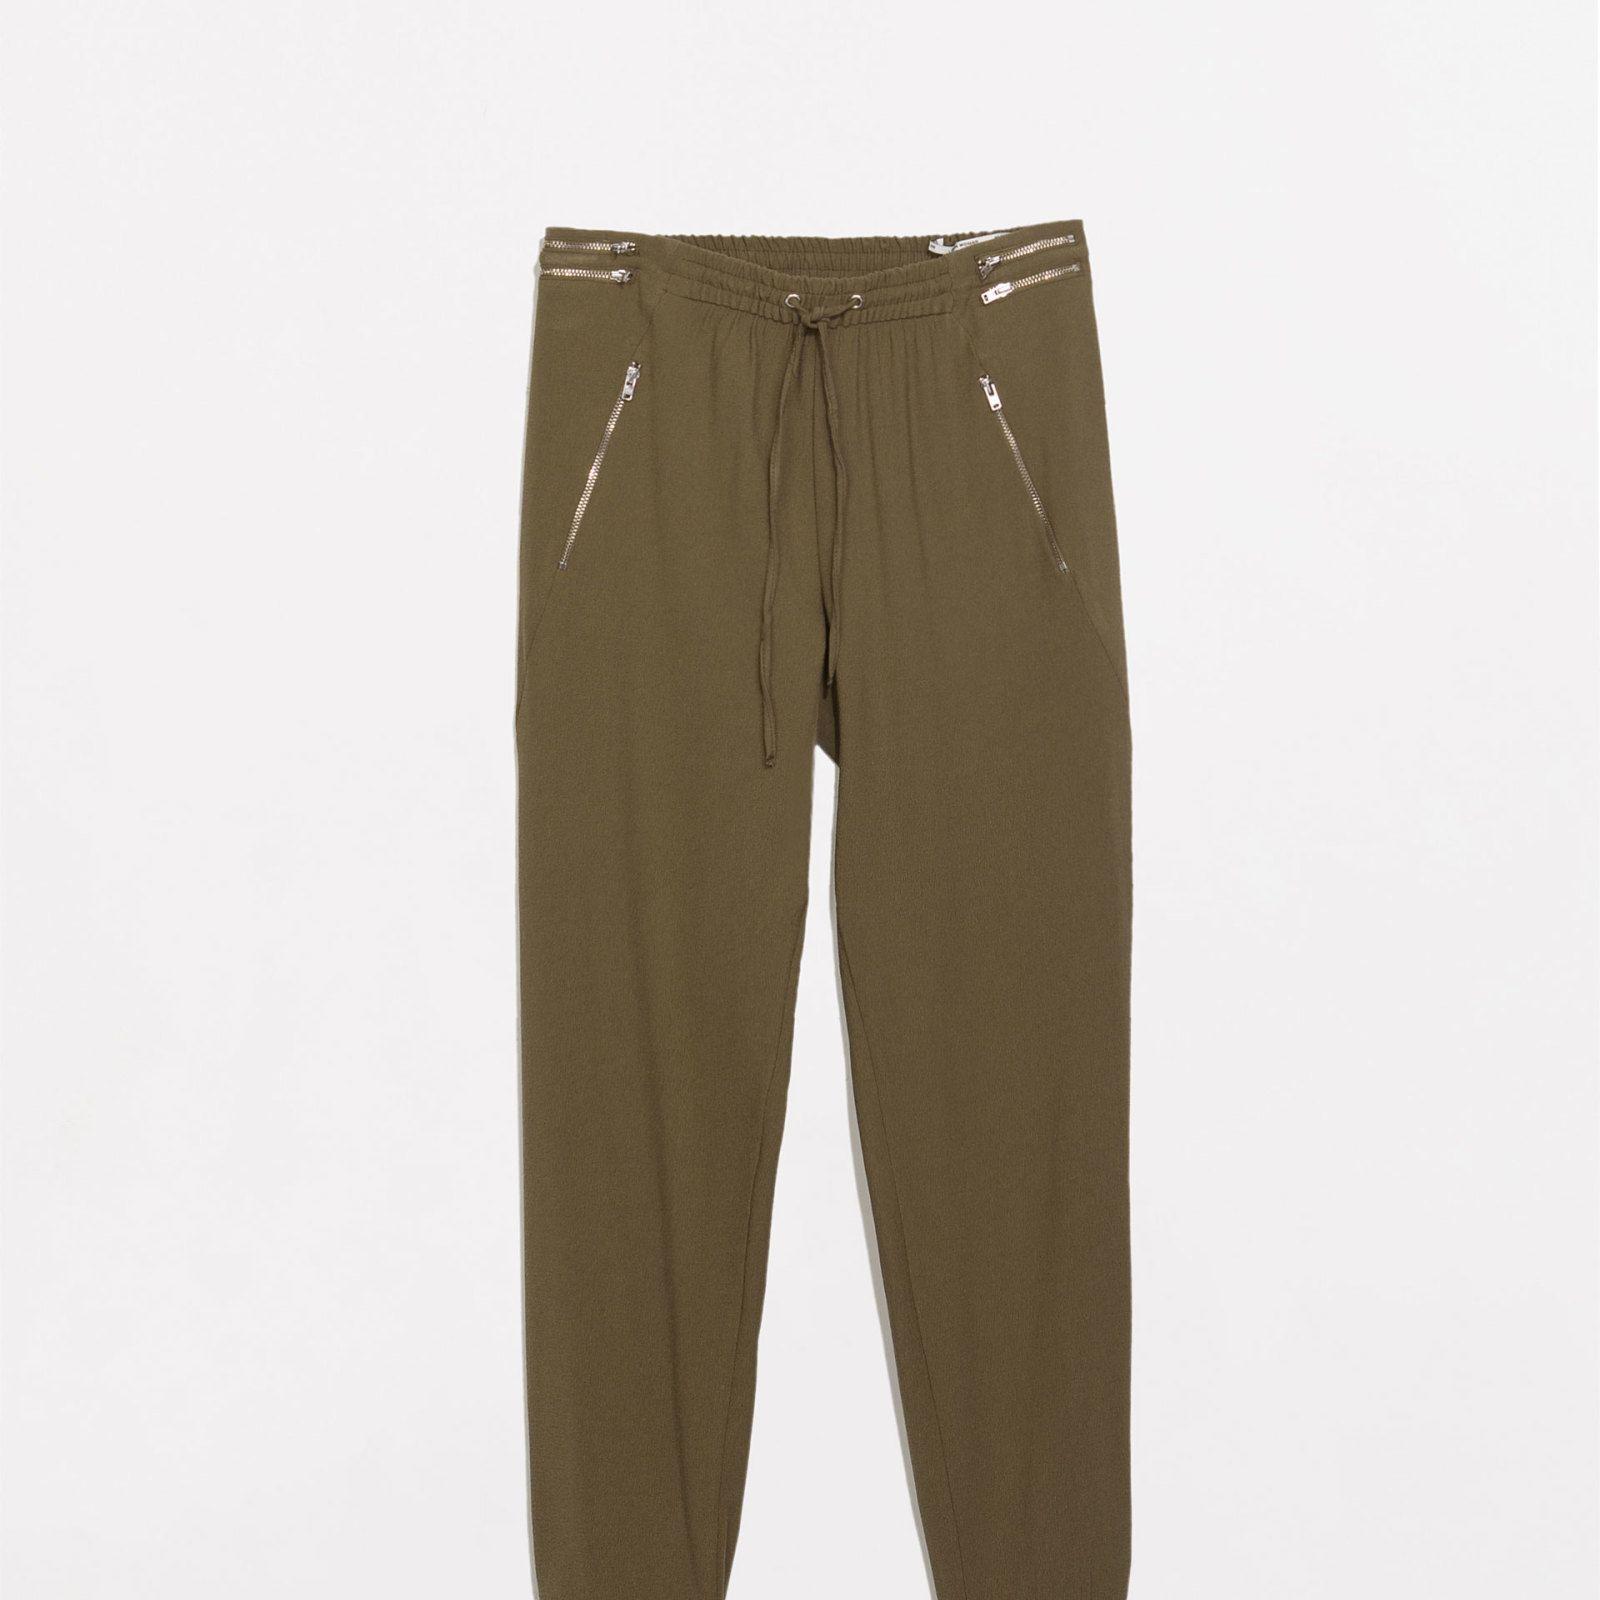 Jogging pants, £39.99, Zara